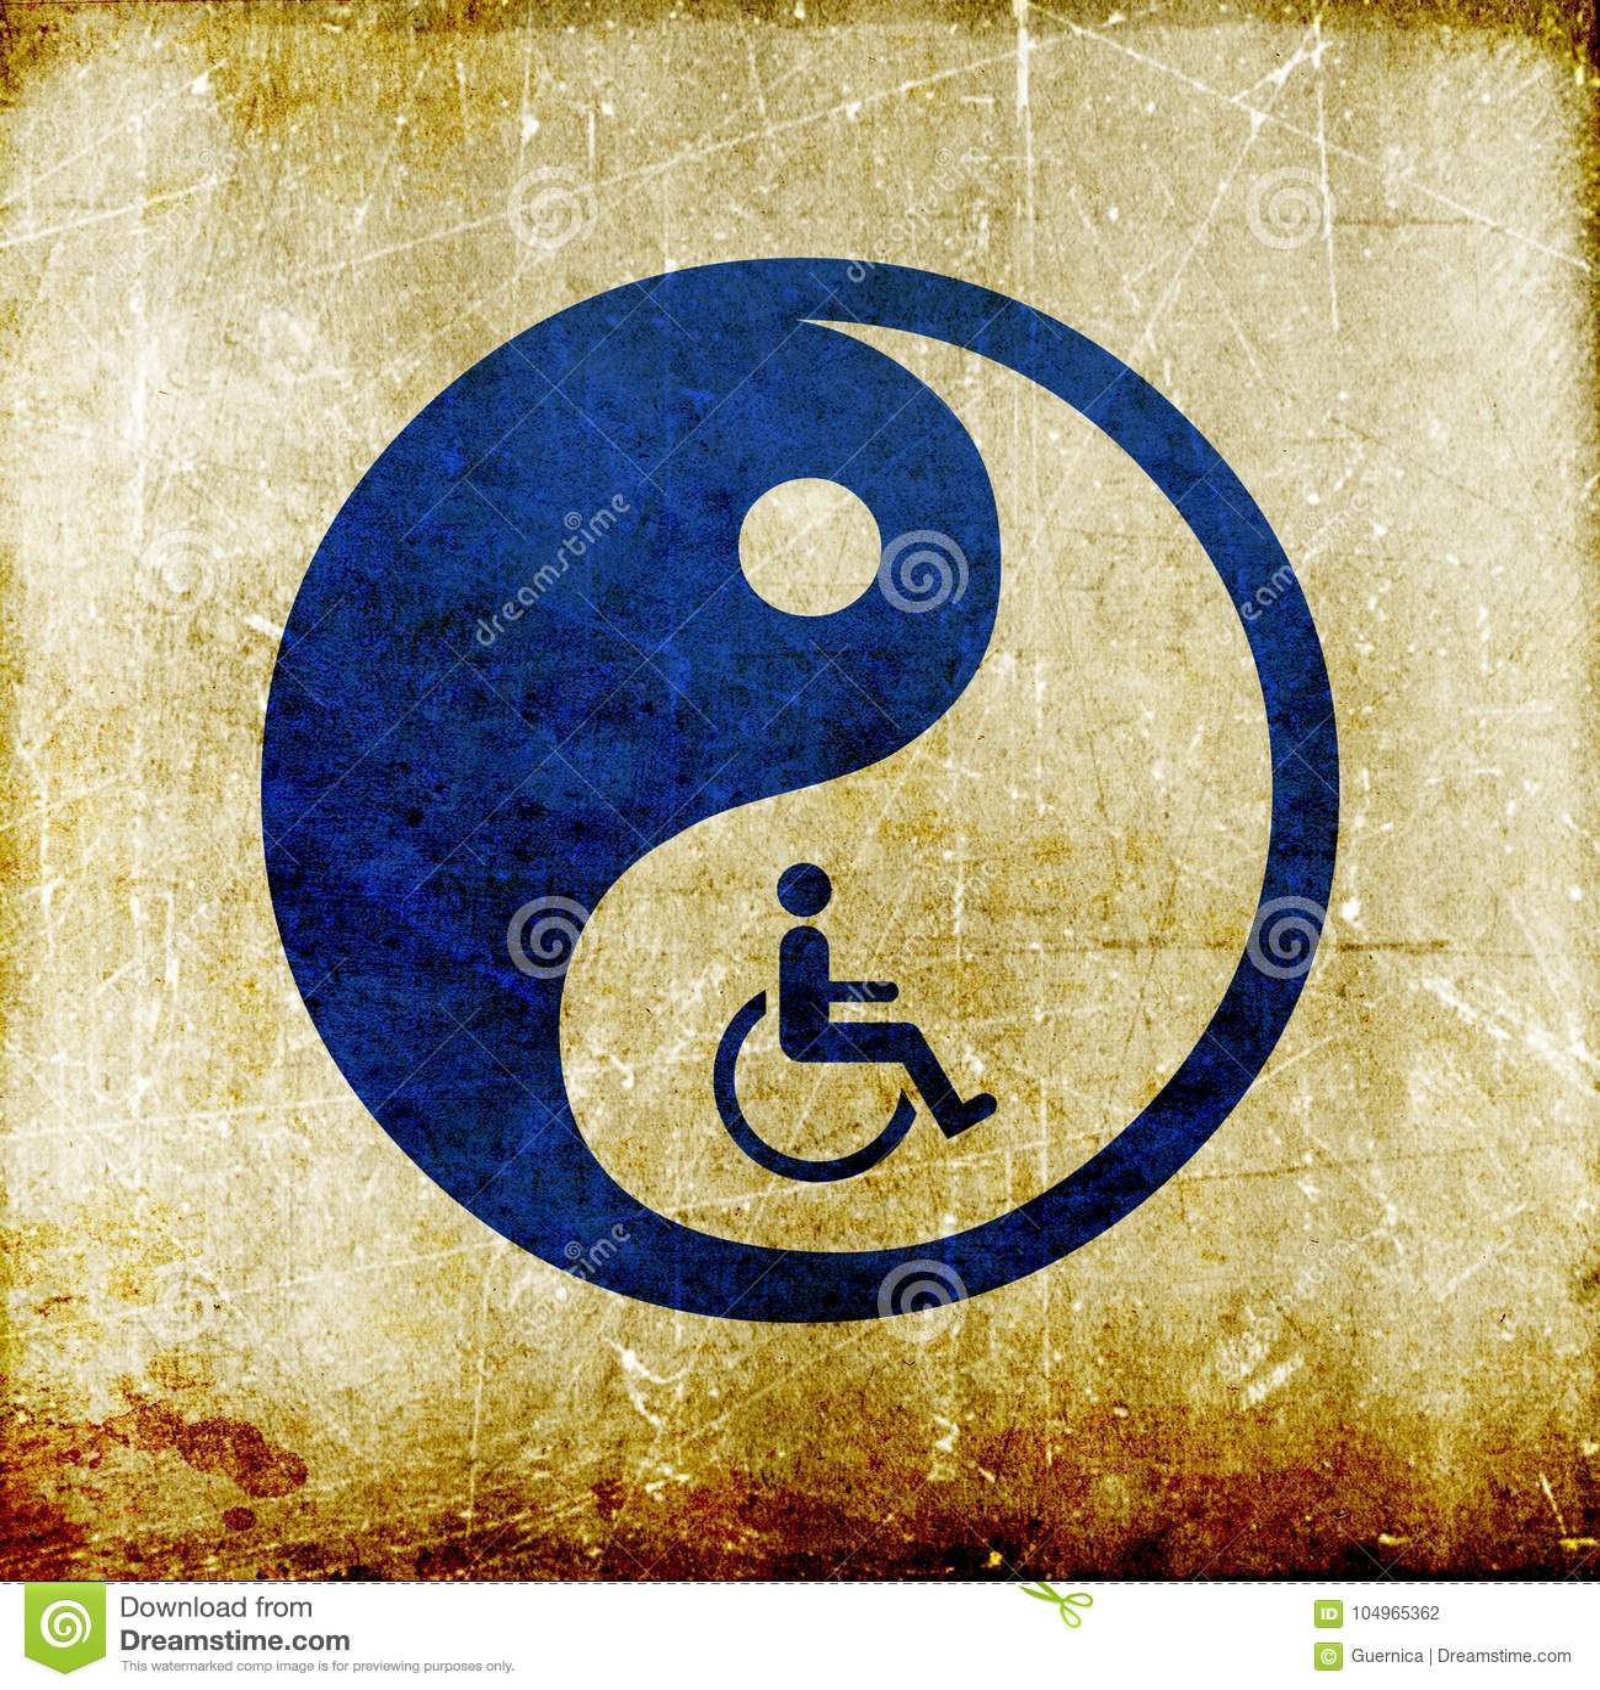 Yin yang symbol represent oriental medicine